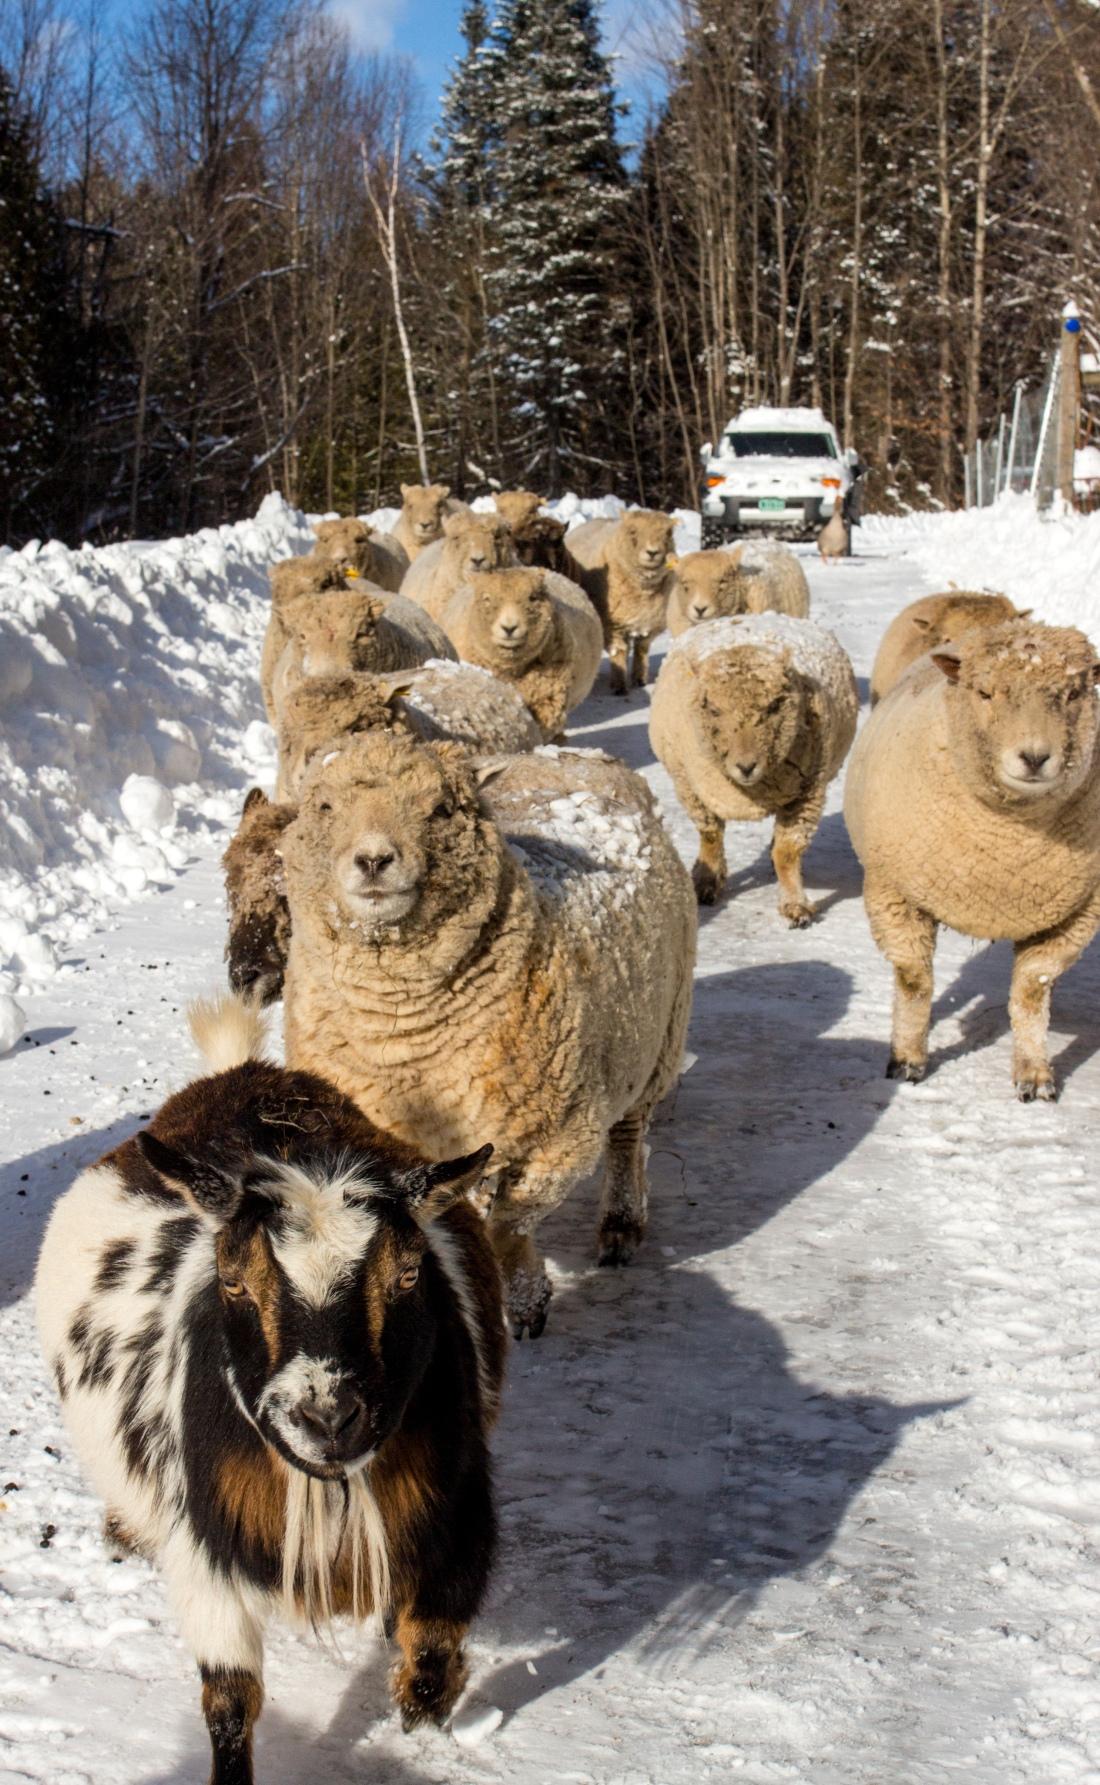 sheep goat snowy driveway.jpg